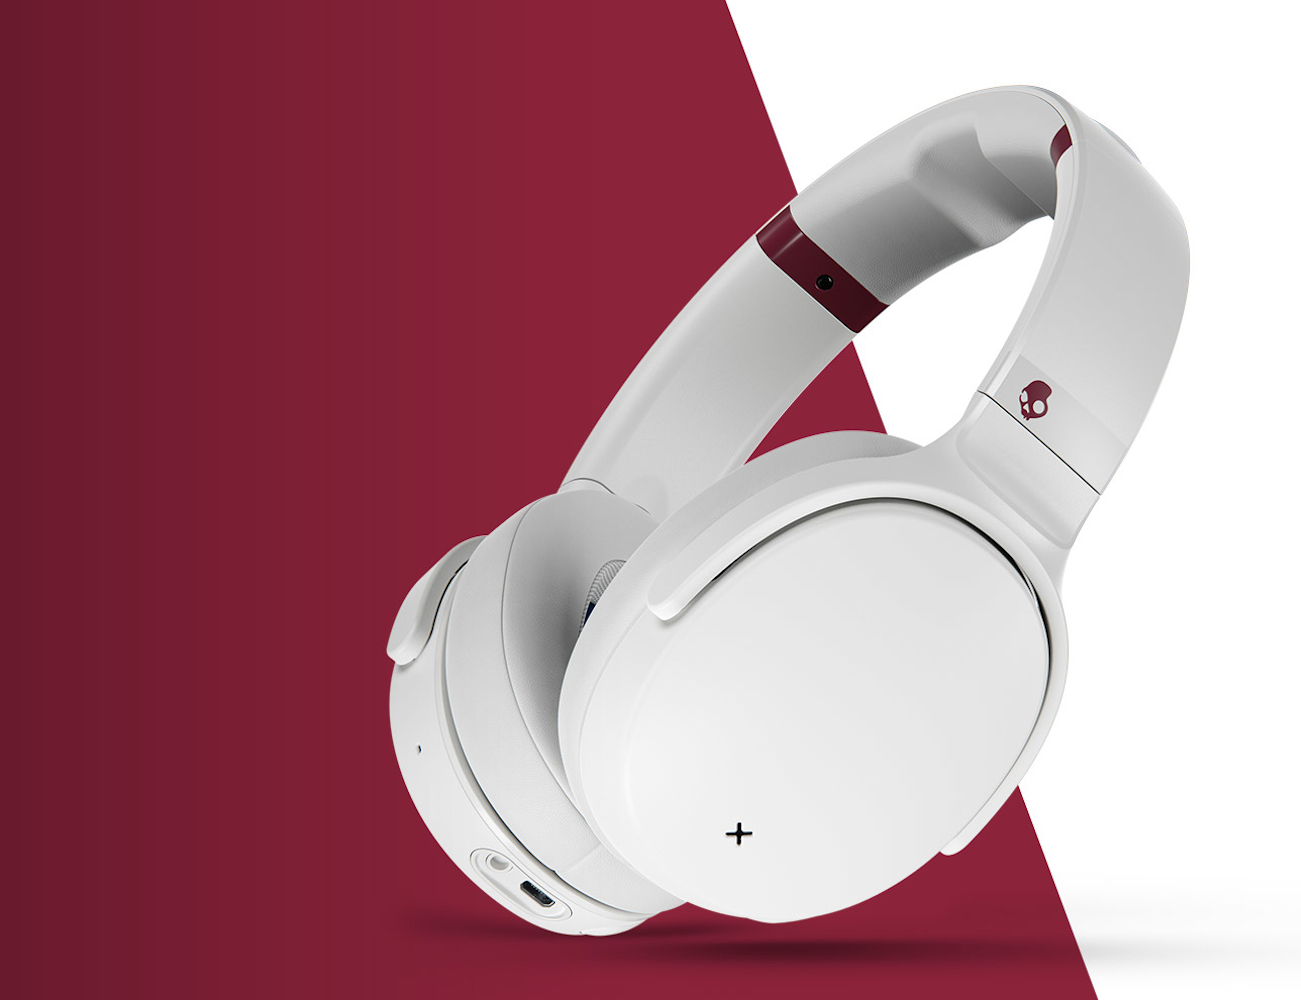 Skullcandy Venue Noise Canceling Wireless Headphone